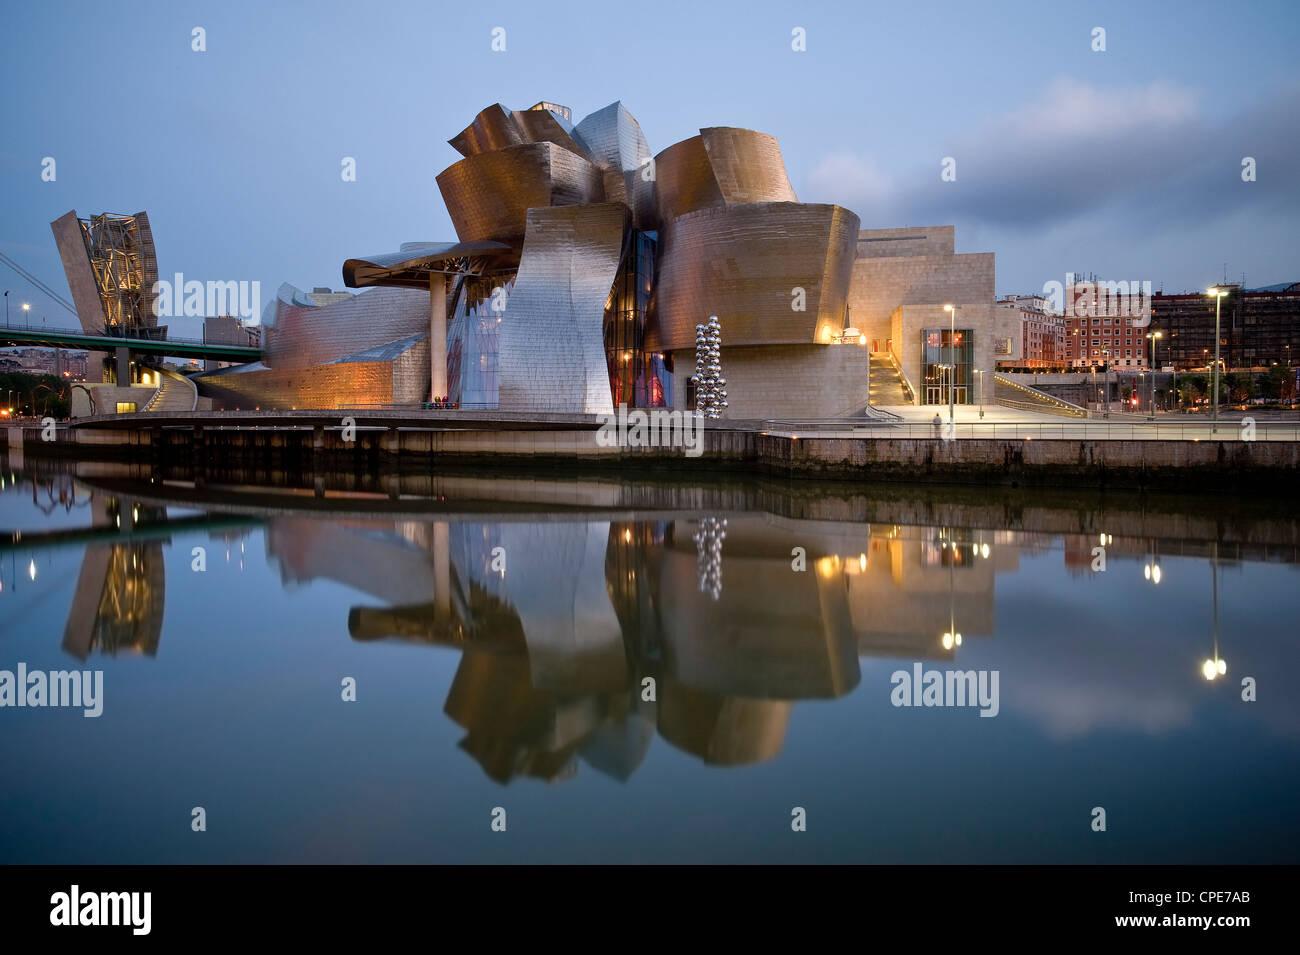 Guggenheim Museum, Bilbao, Euskal Herria, Euskadi, Spain, Europe - Stock Image